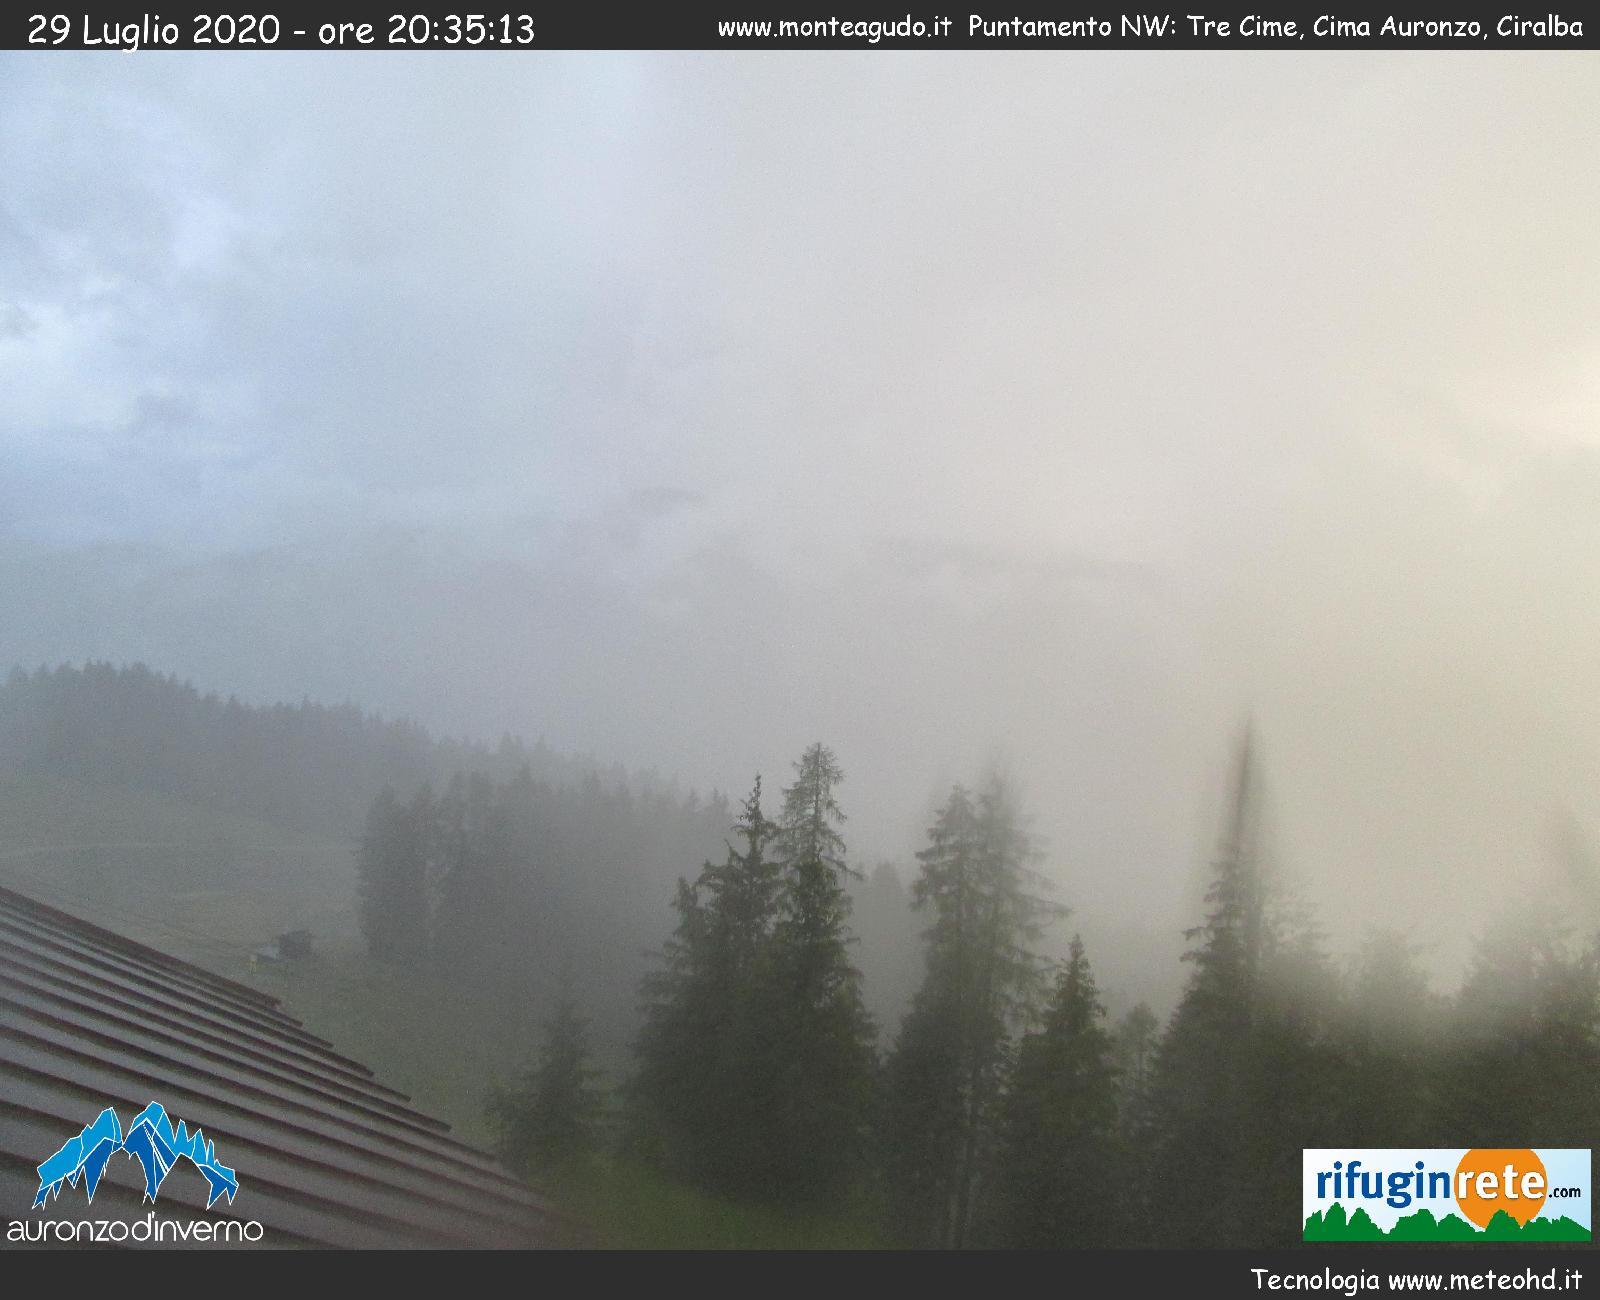 Webcam Auronzo di Cadore Monte Agudo